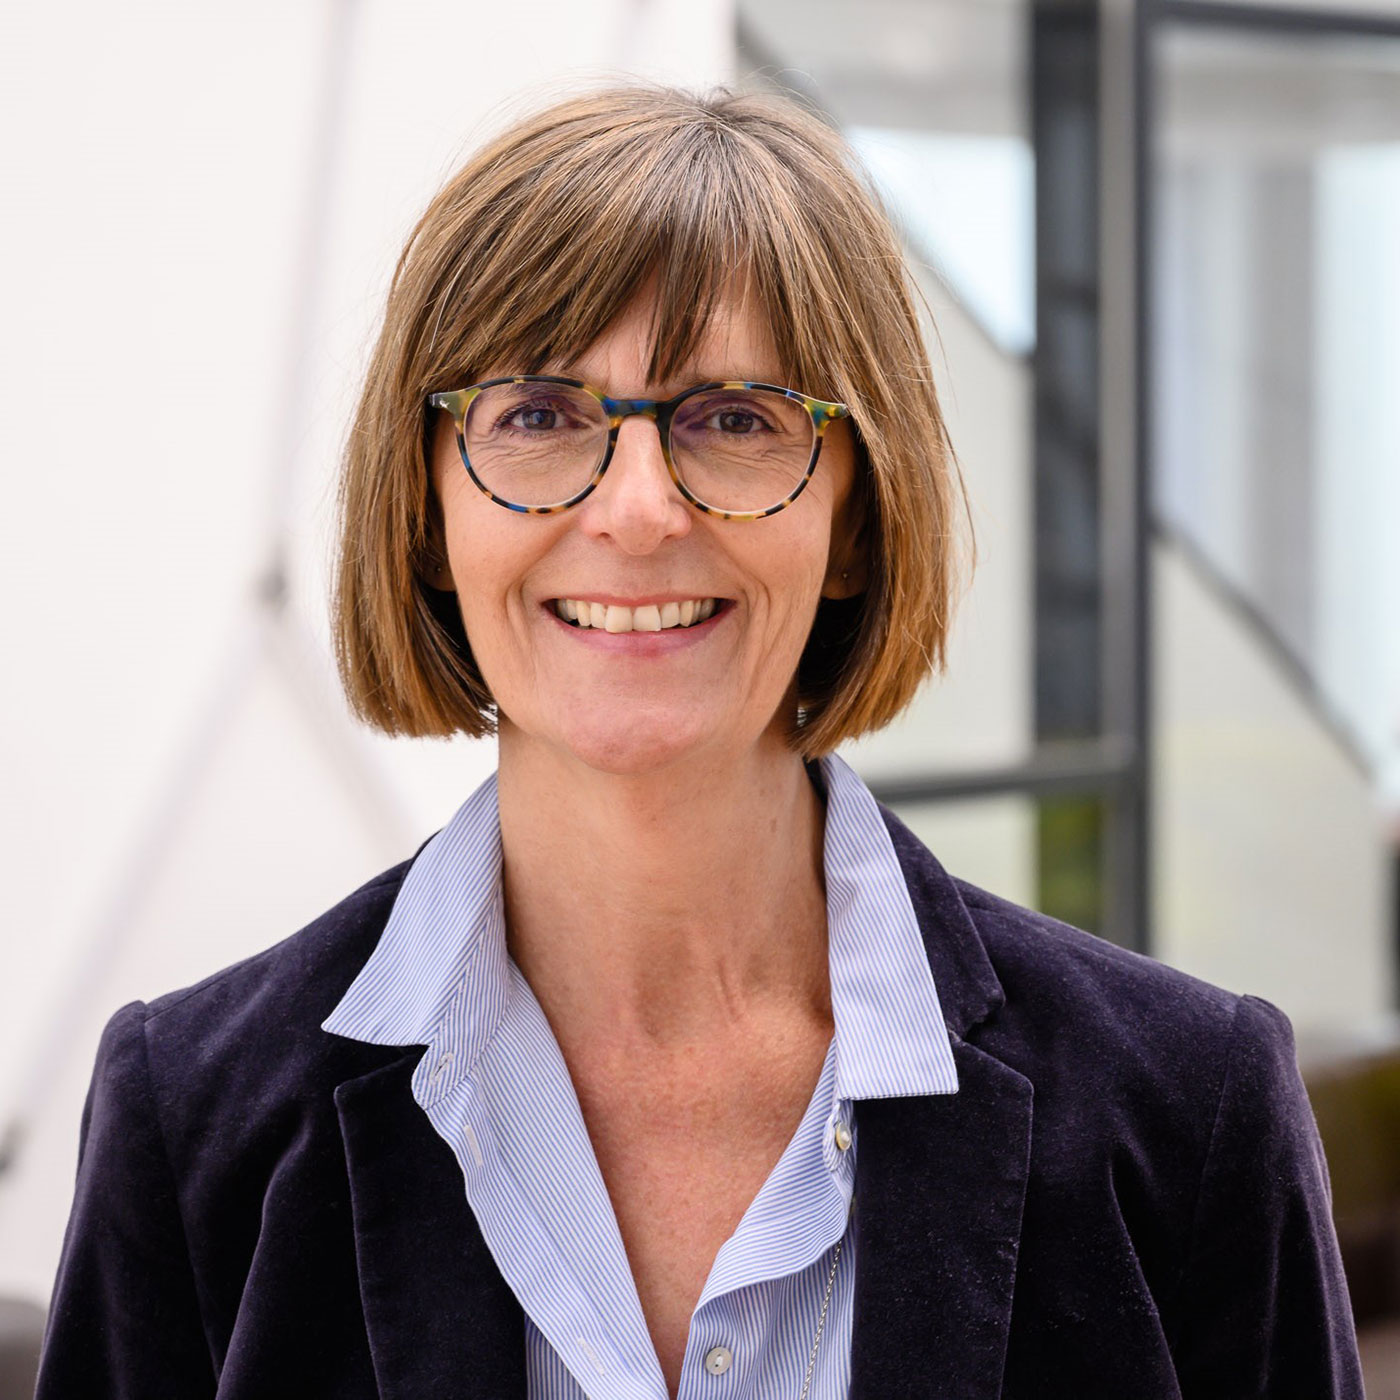 Sabine Tewes-Huethorst